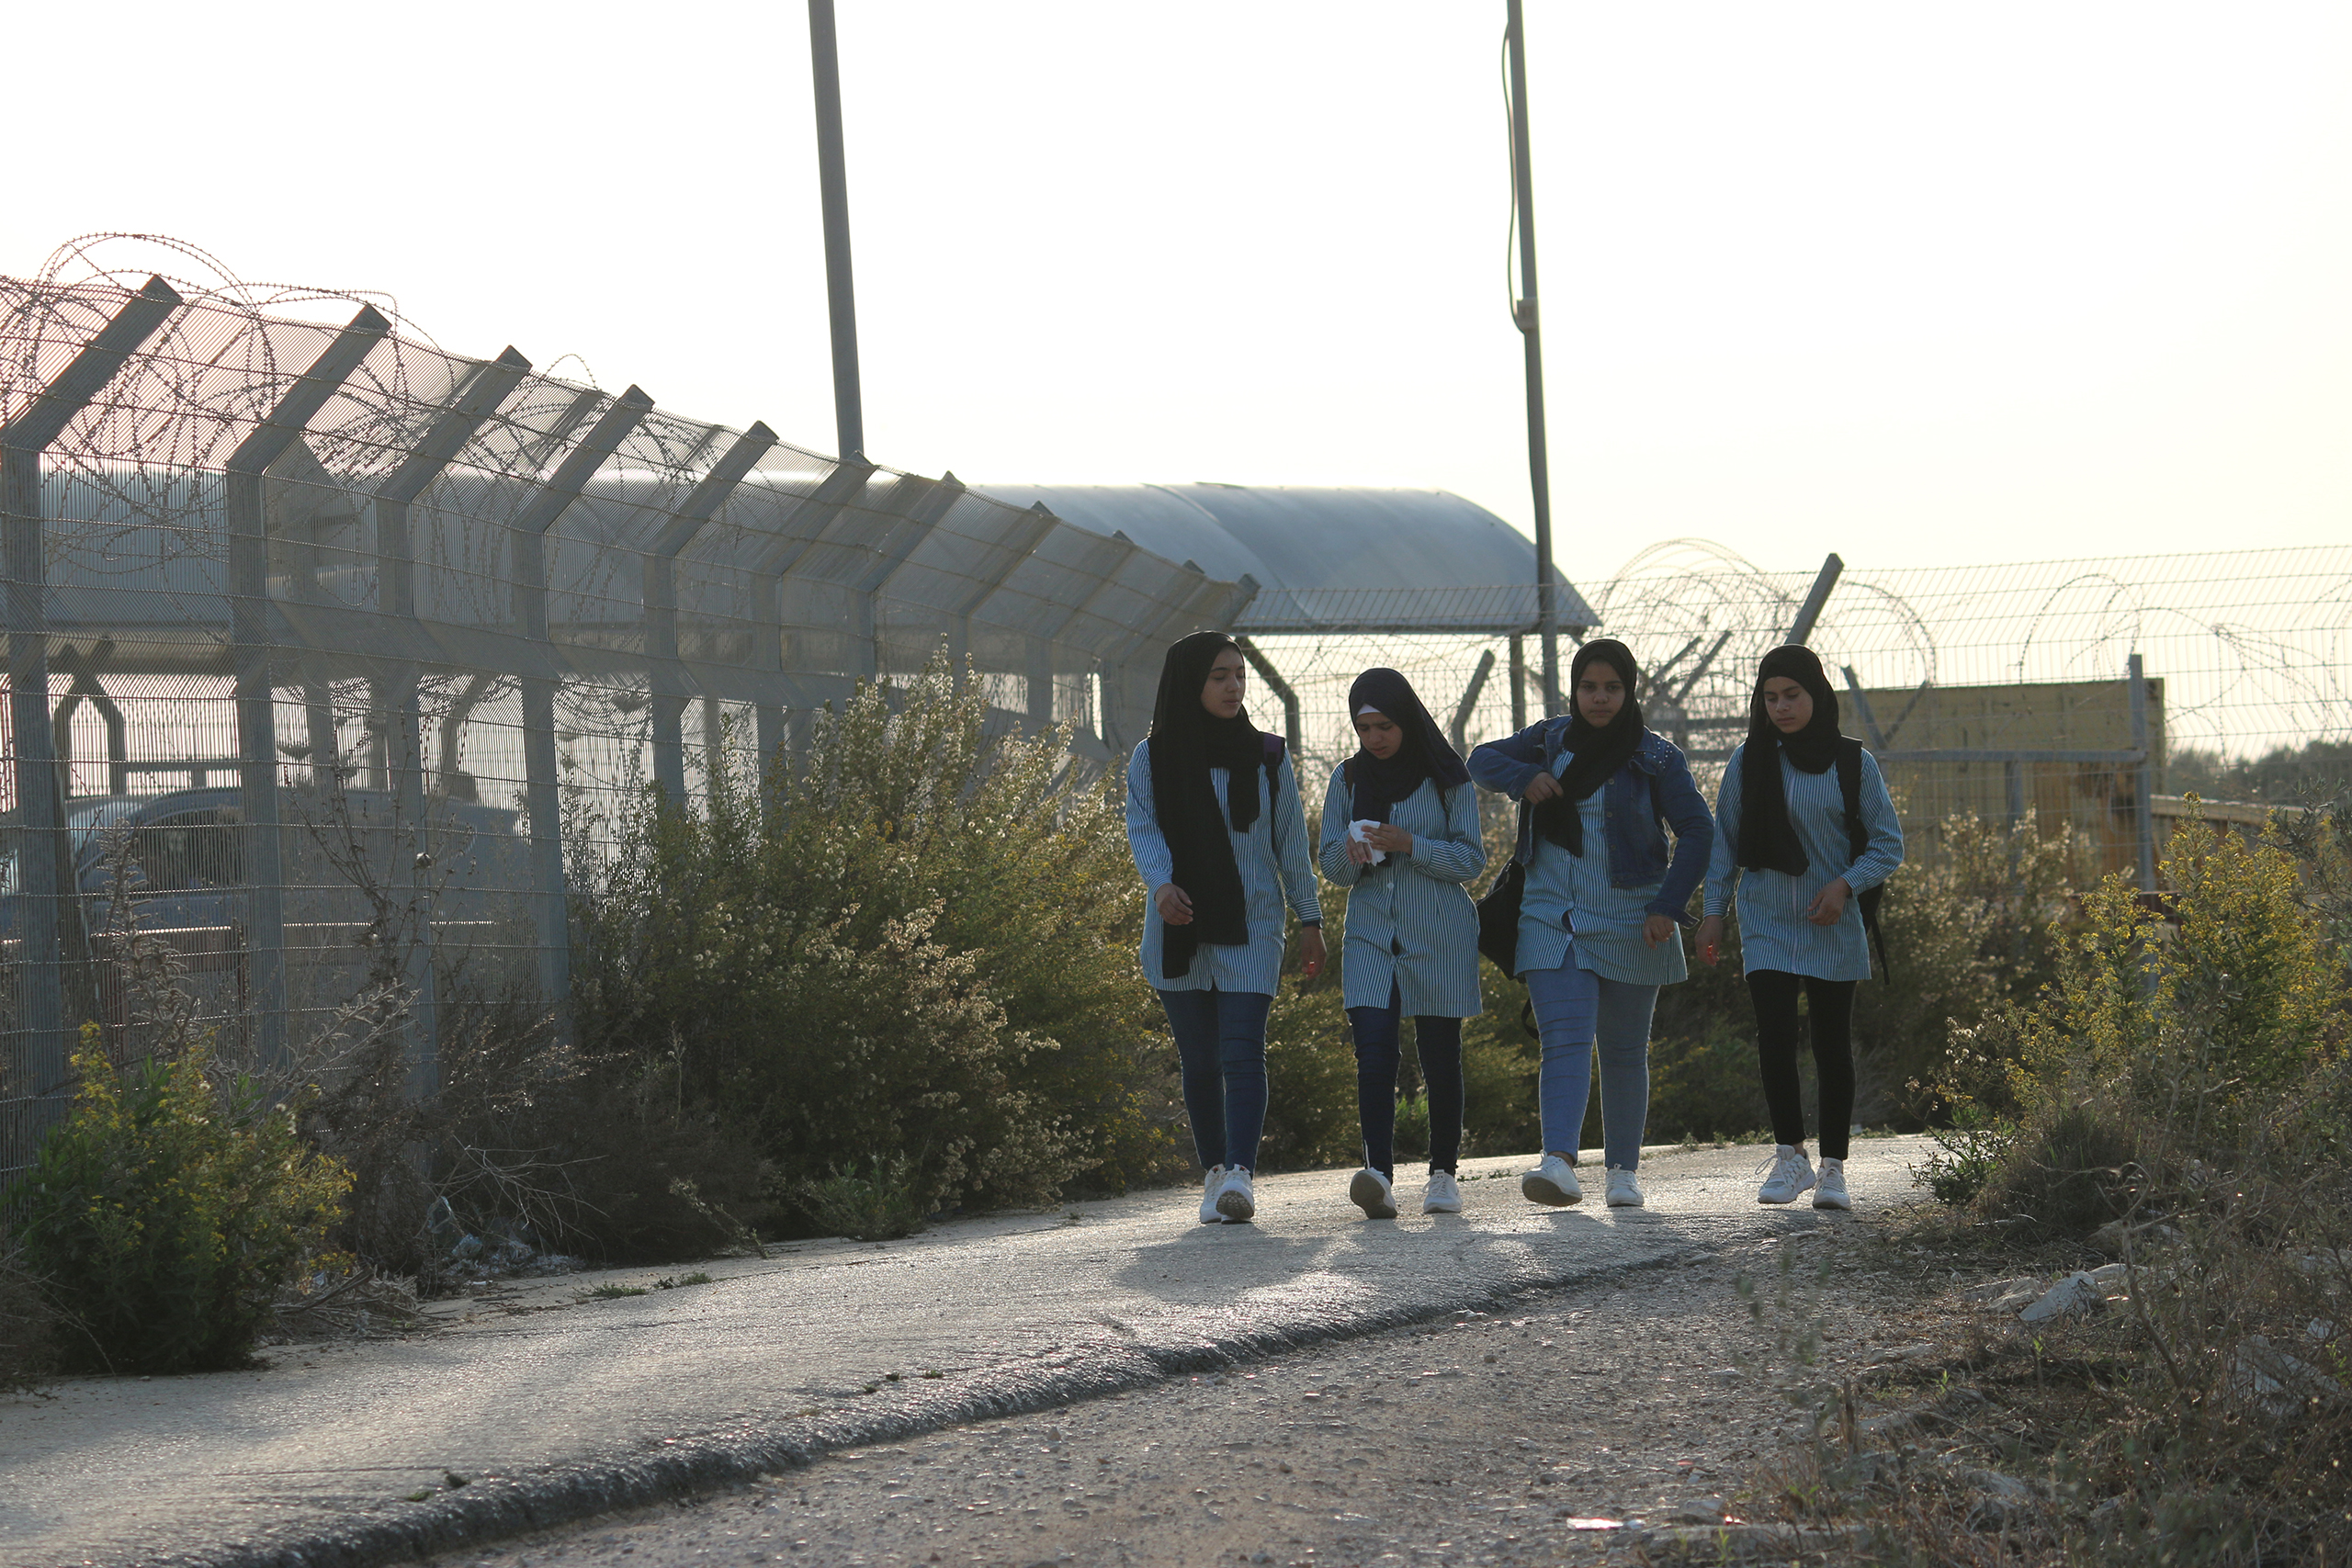 Palestinian students from Dahr Al-Maleh walk toward their school in Tura Al-Gharbiya village after crossing the Israeli military checkpoint on November 07, 2019. (Photo: DCIP / Ahmad Al-Bazz)